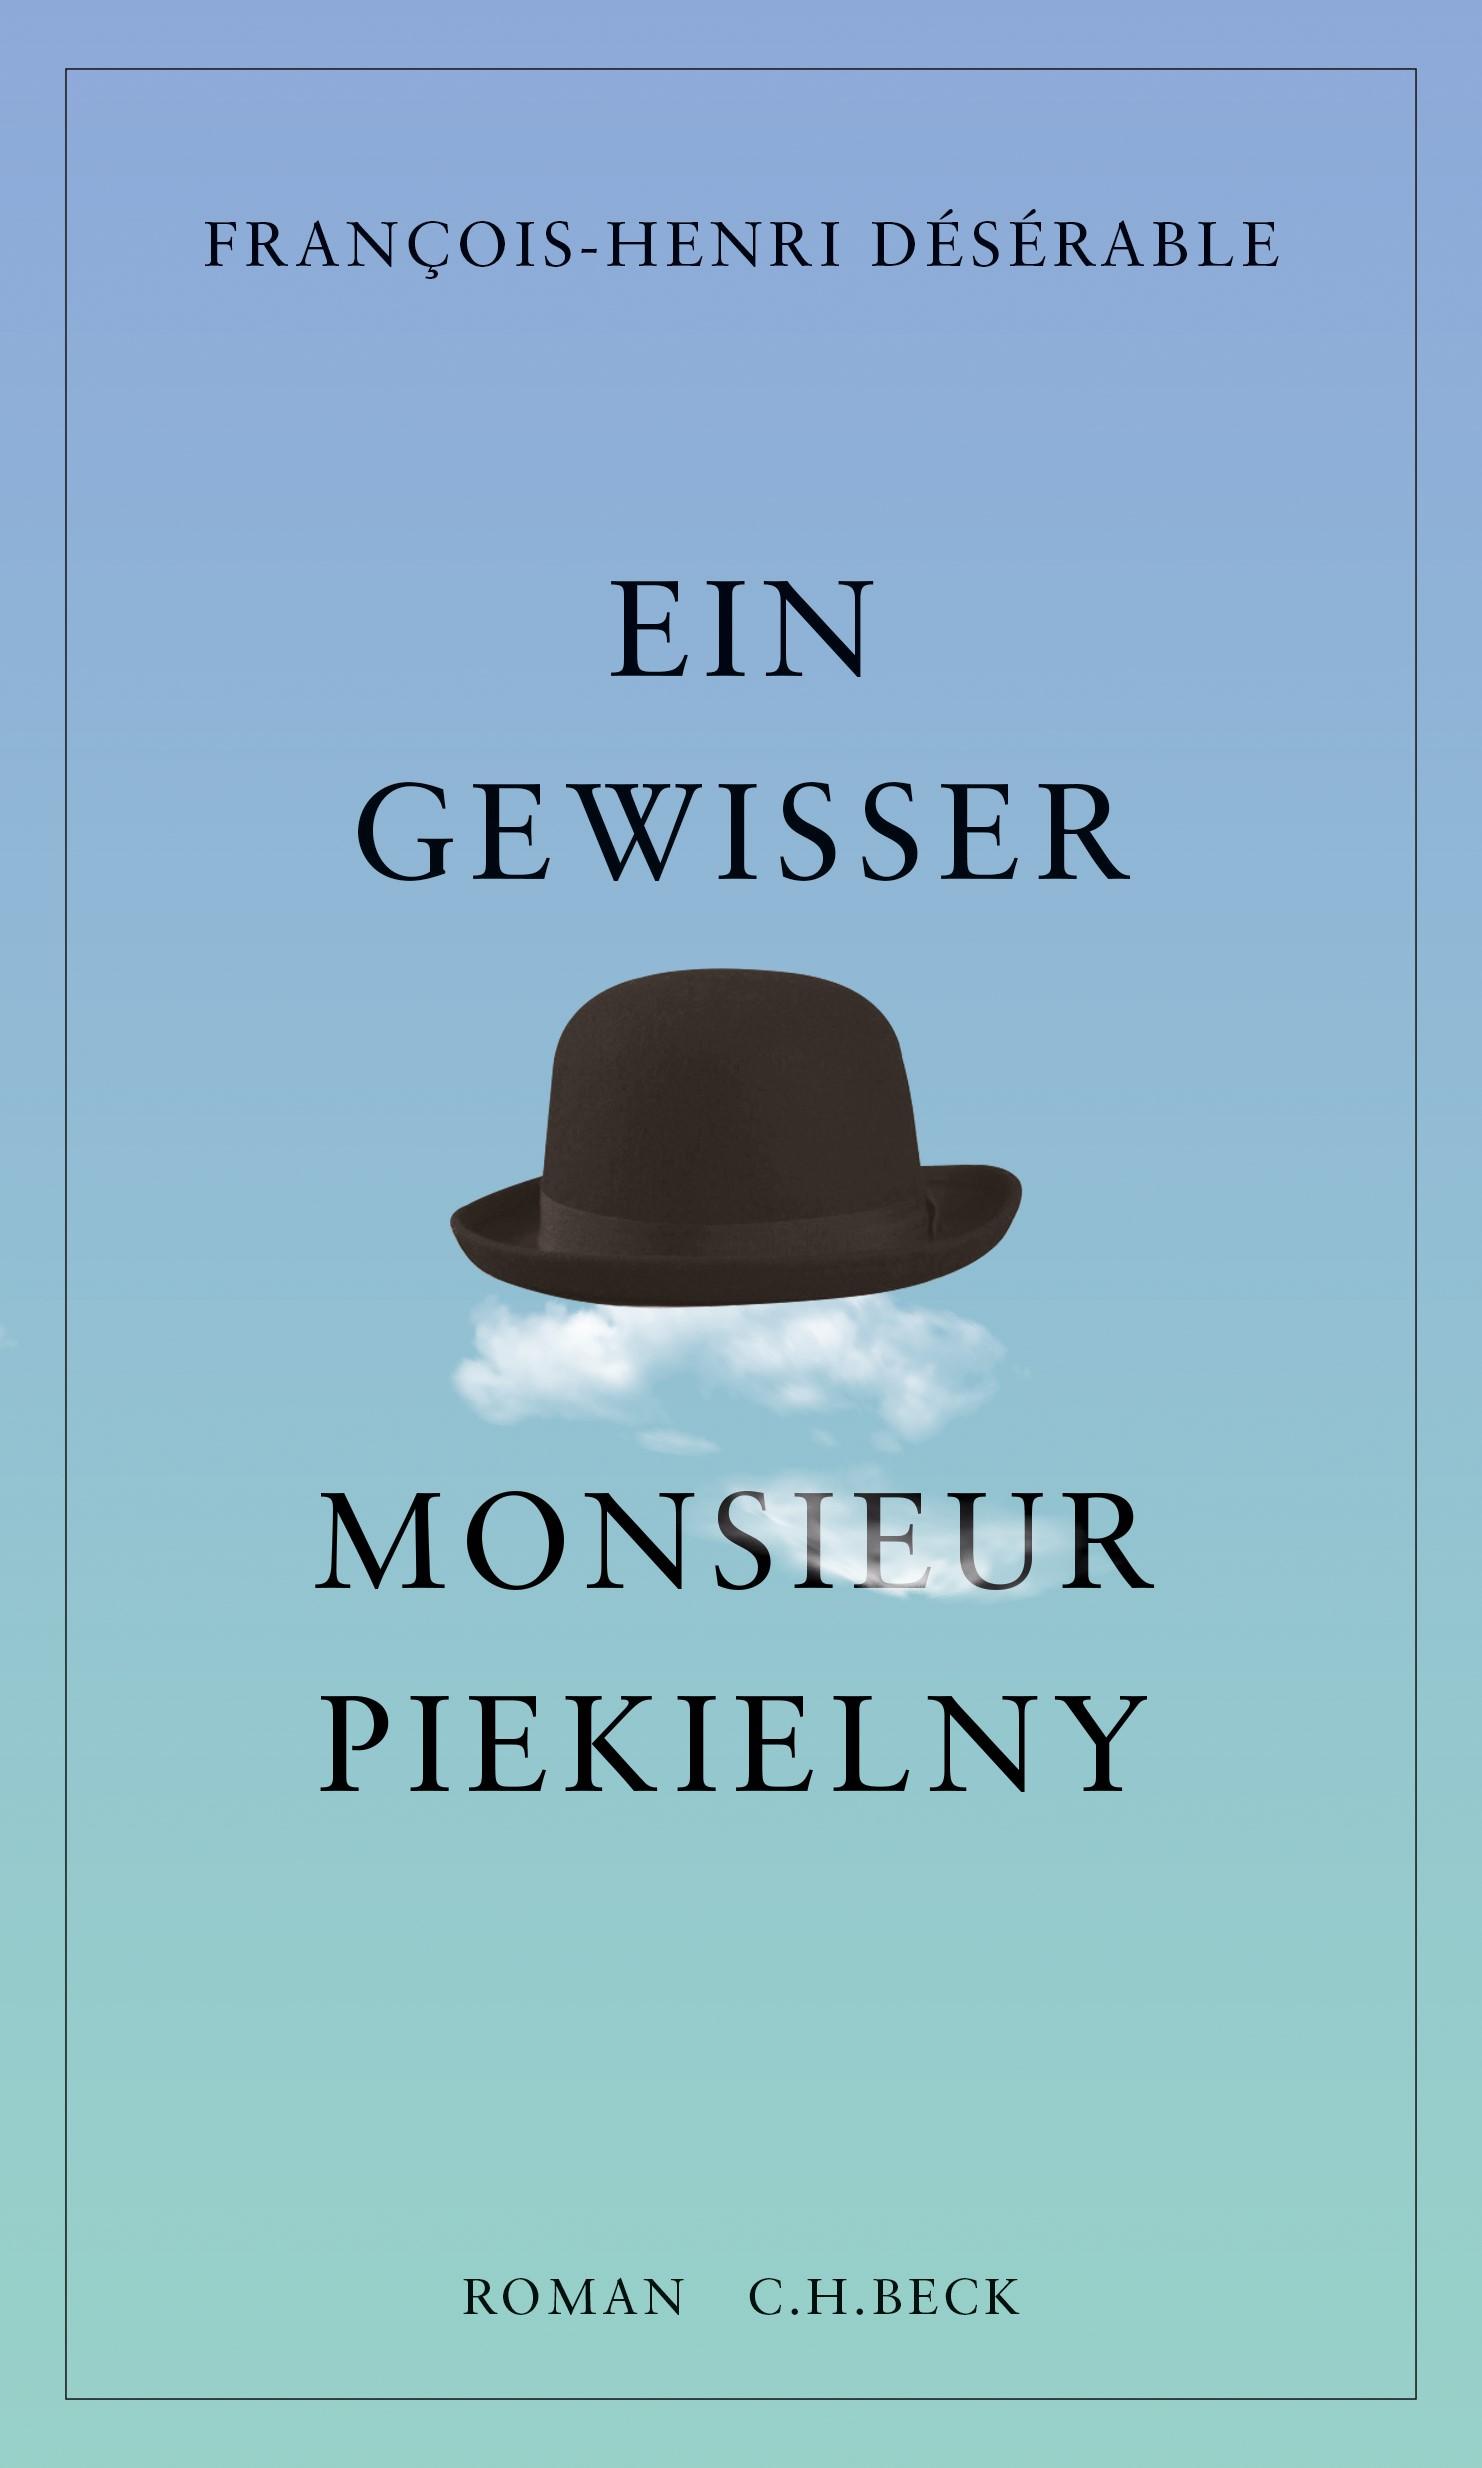 Francois-Henri Désérable, Ein gewisser Monsieur Piekielny